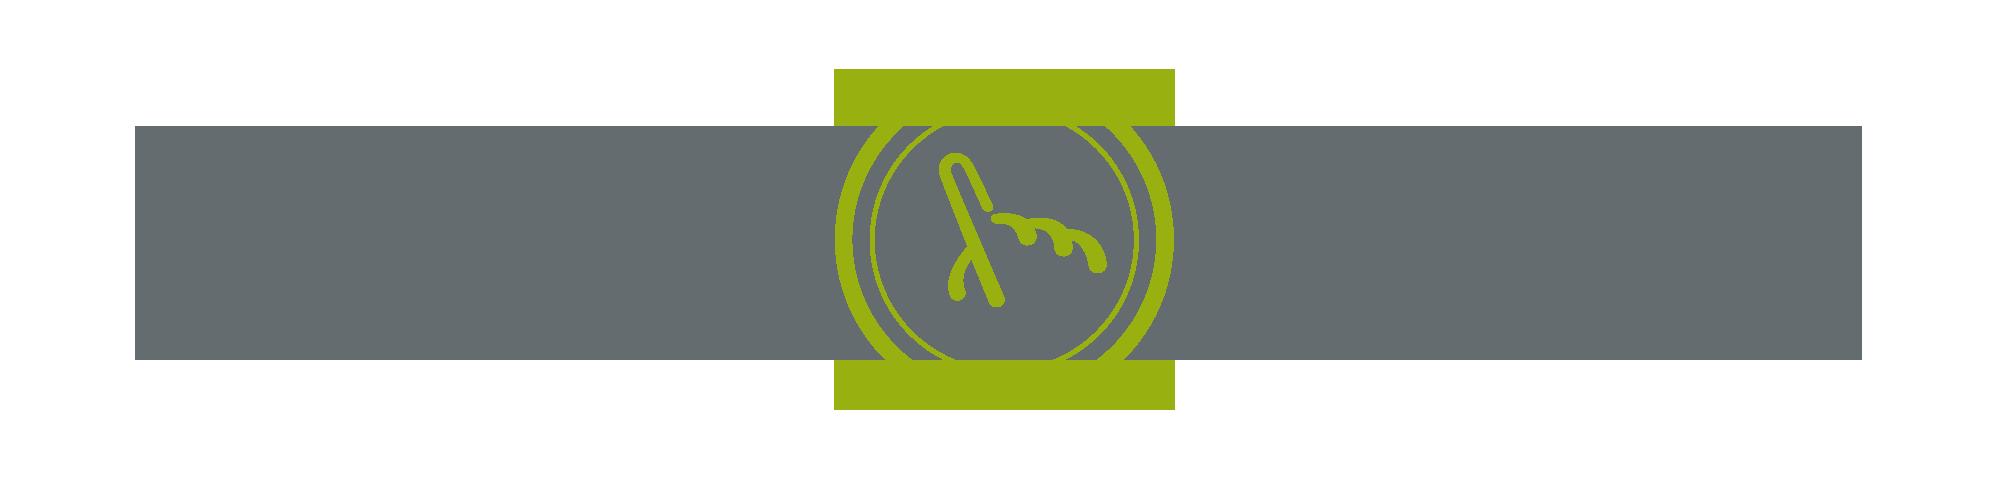 Fuzzy_Math_Logo.png